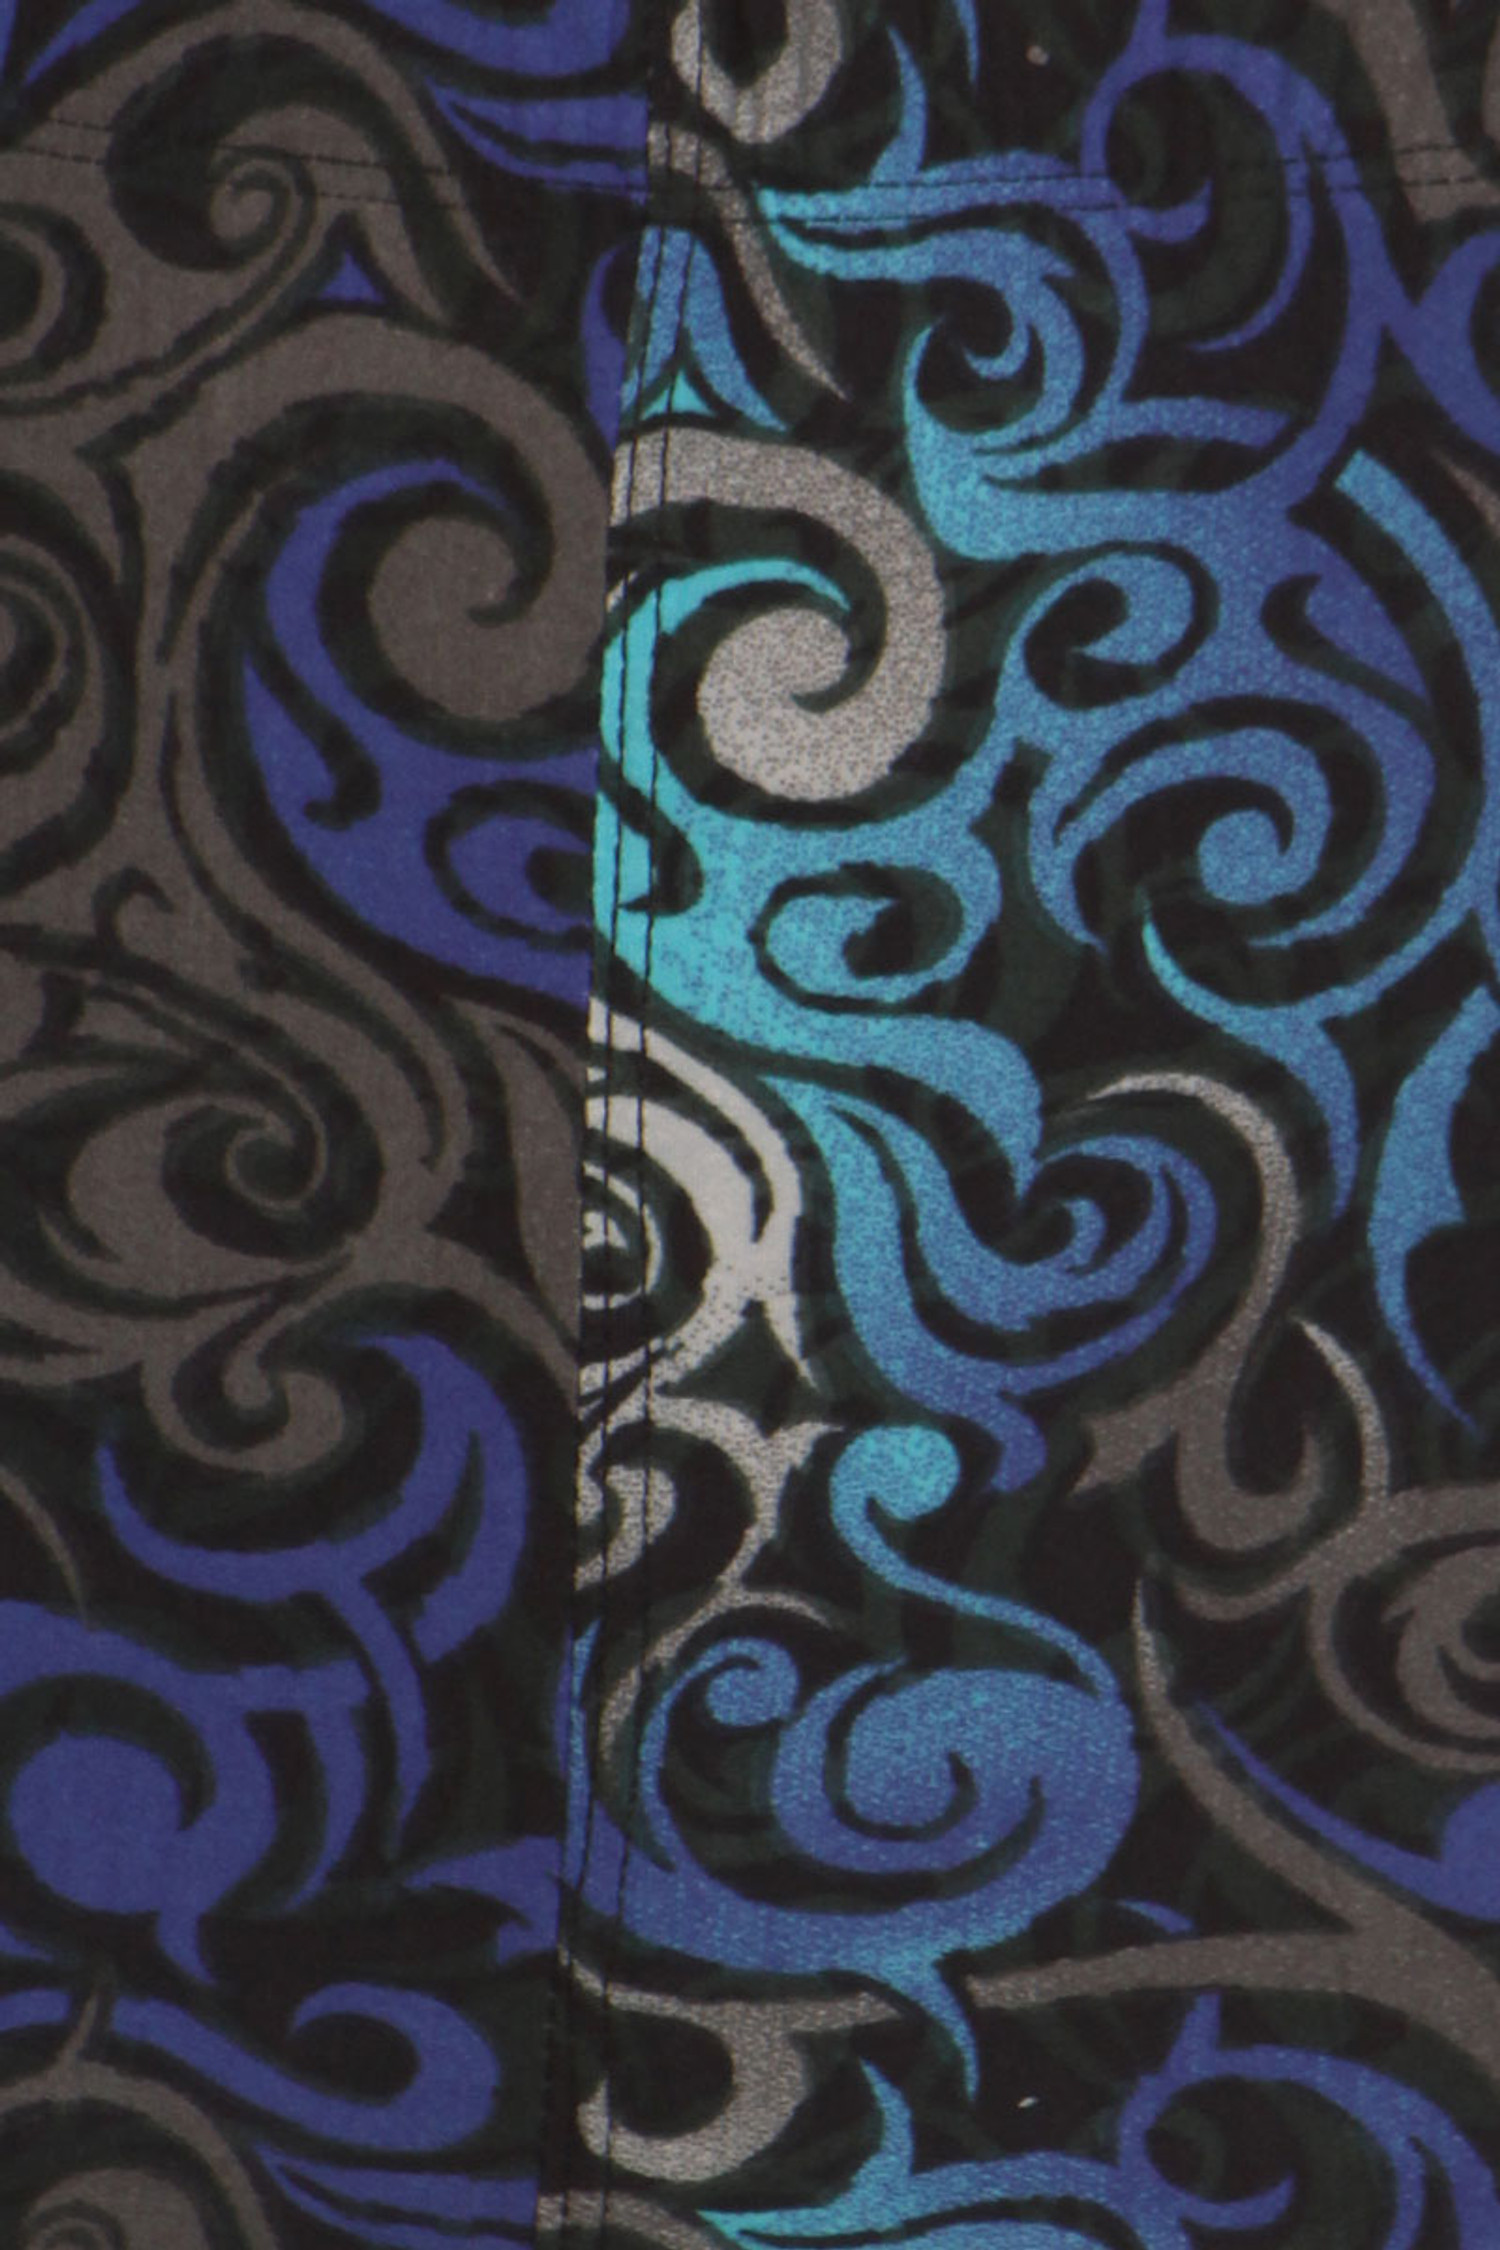 Buttery Soft Tangled Swirl High Waisted Plus Size Capri - EEVEE